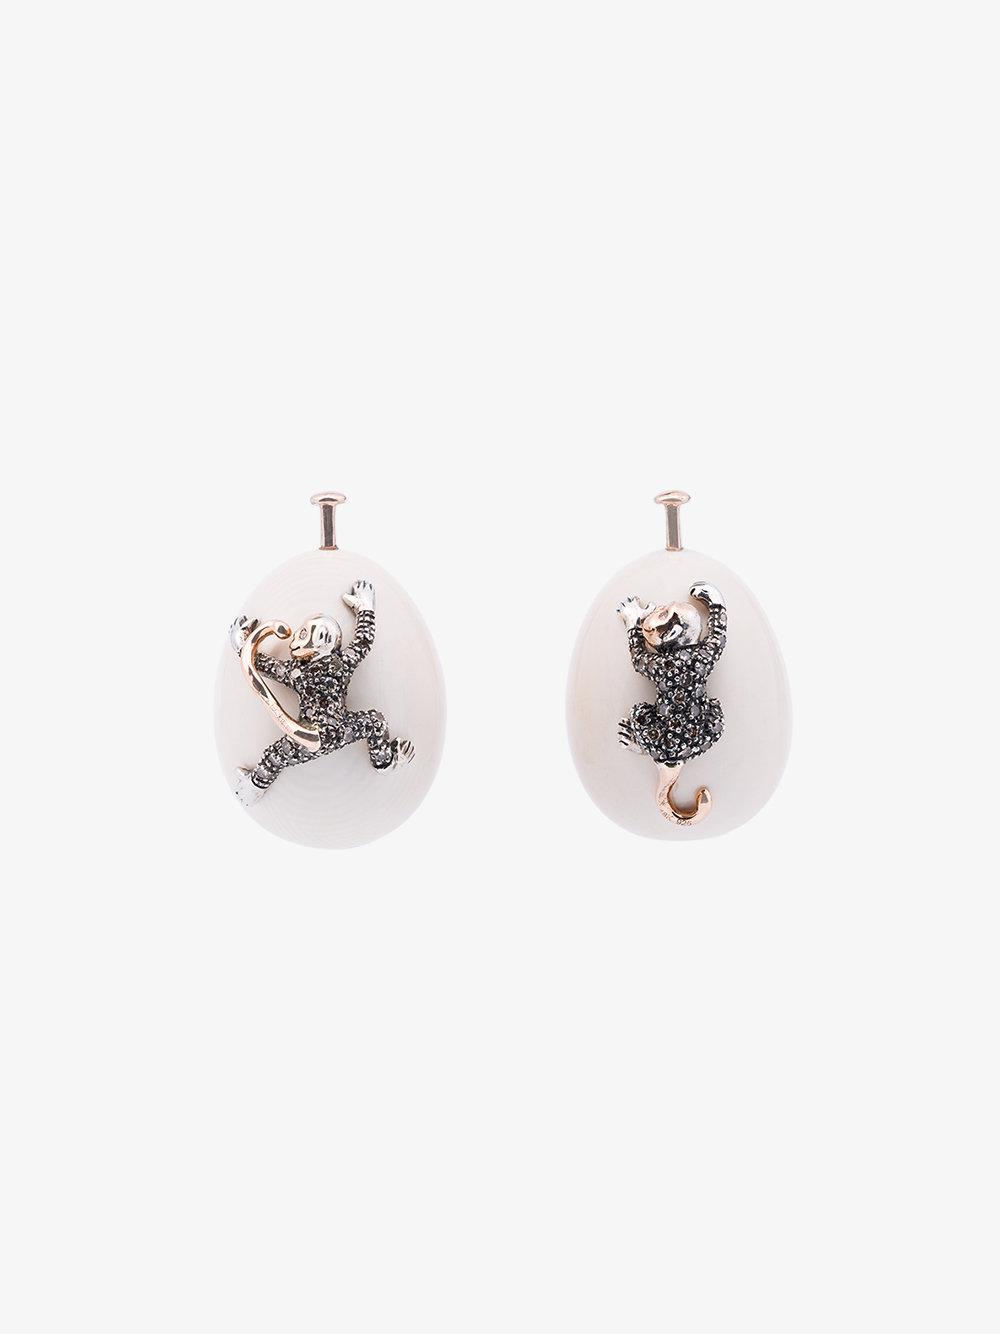 18k yellow gold Hanging Parts mammoth tusk earrings Bibi van der Velden vXx1g